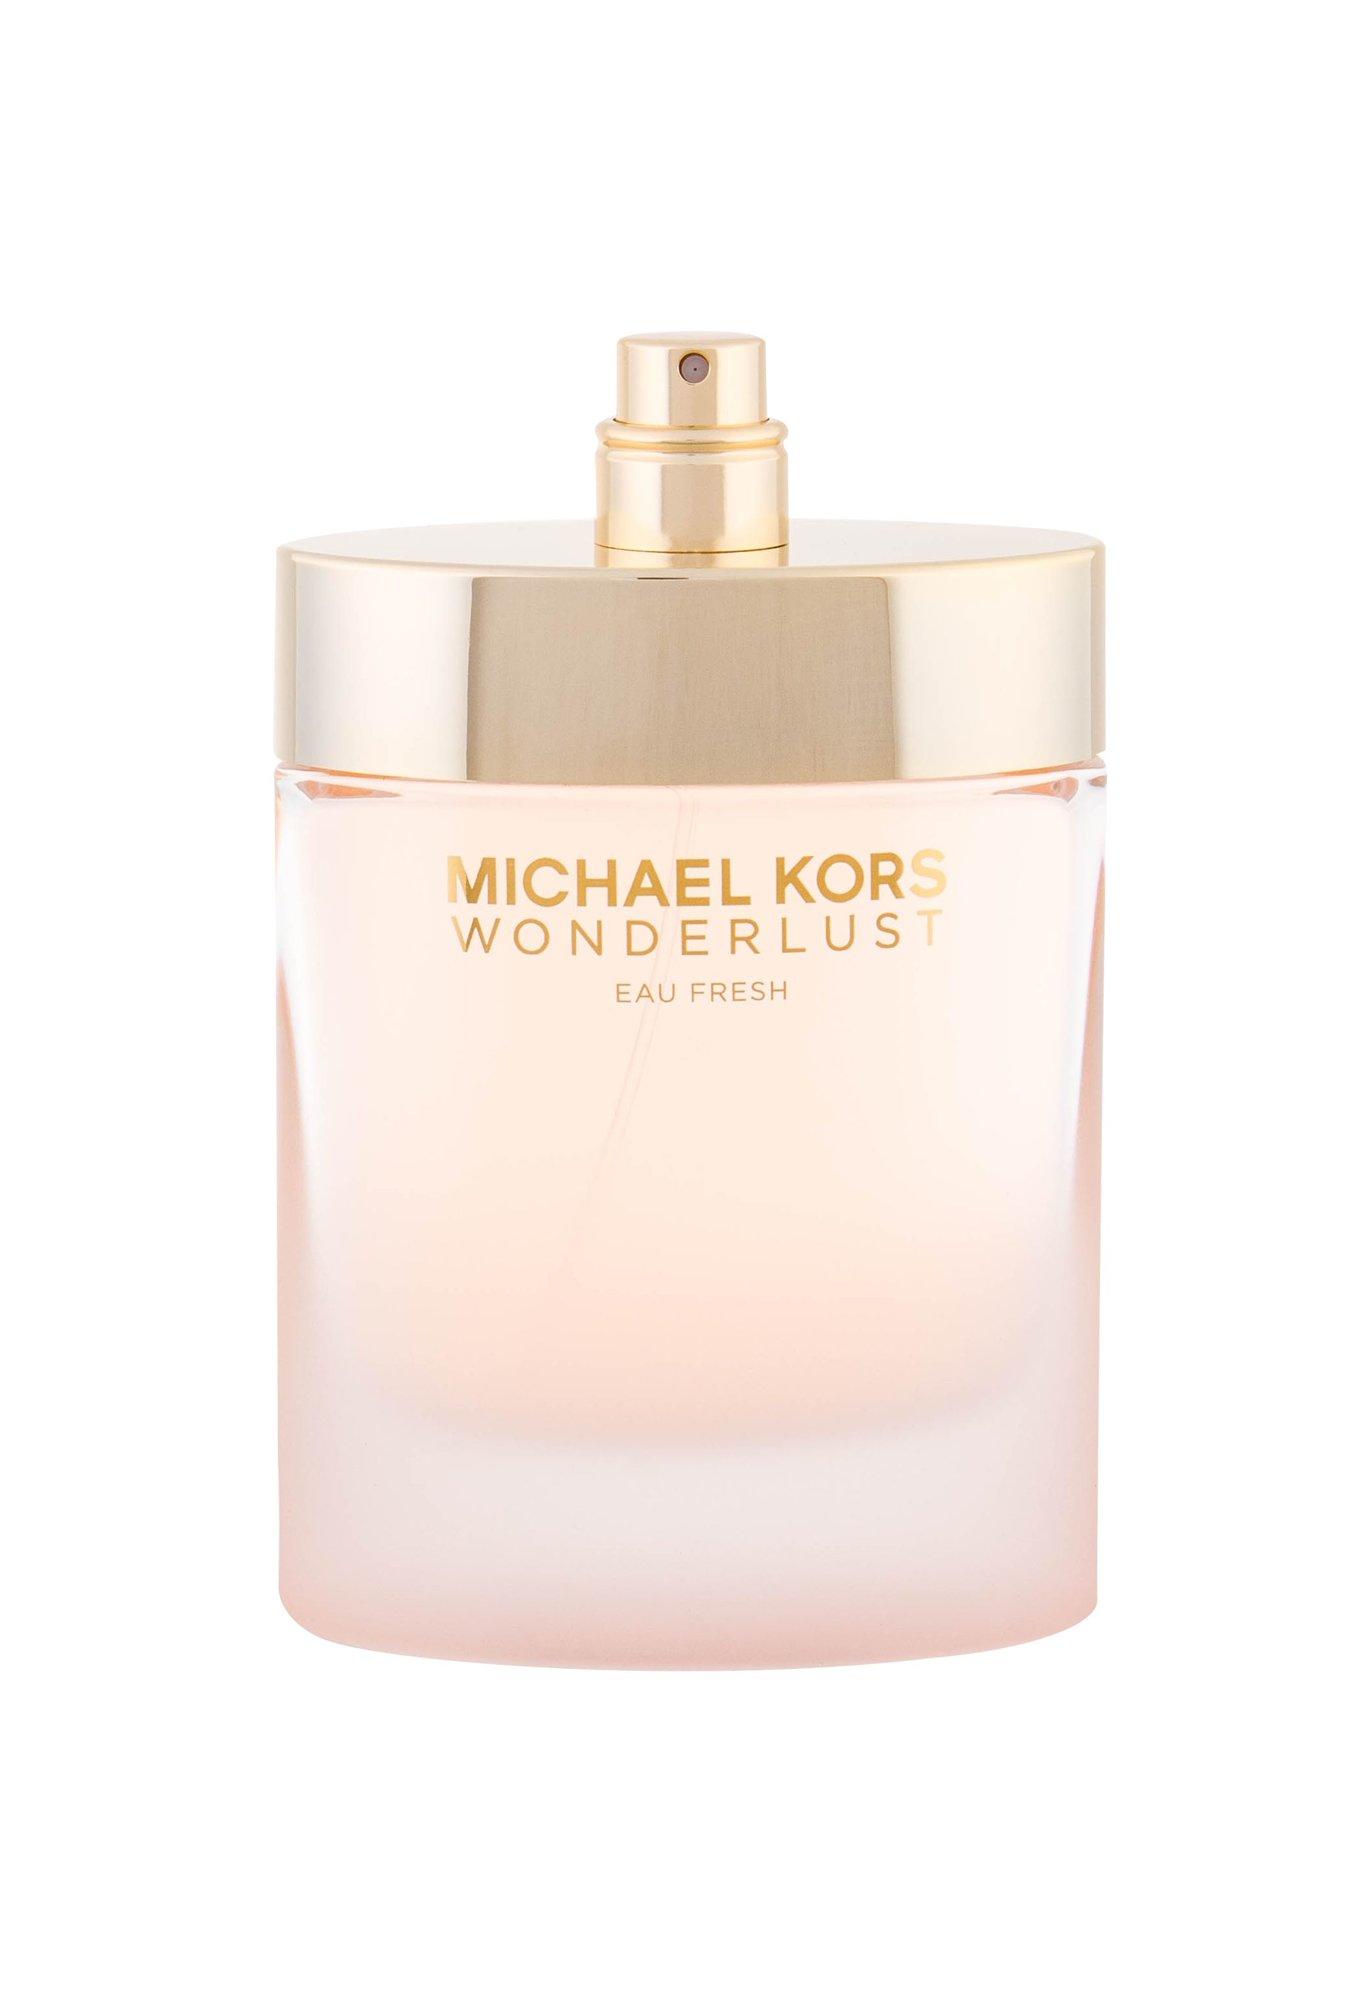 Michael Kors Wonderlust Eau Fresh Eau de Toilette 100ml